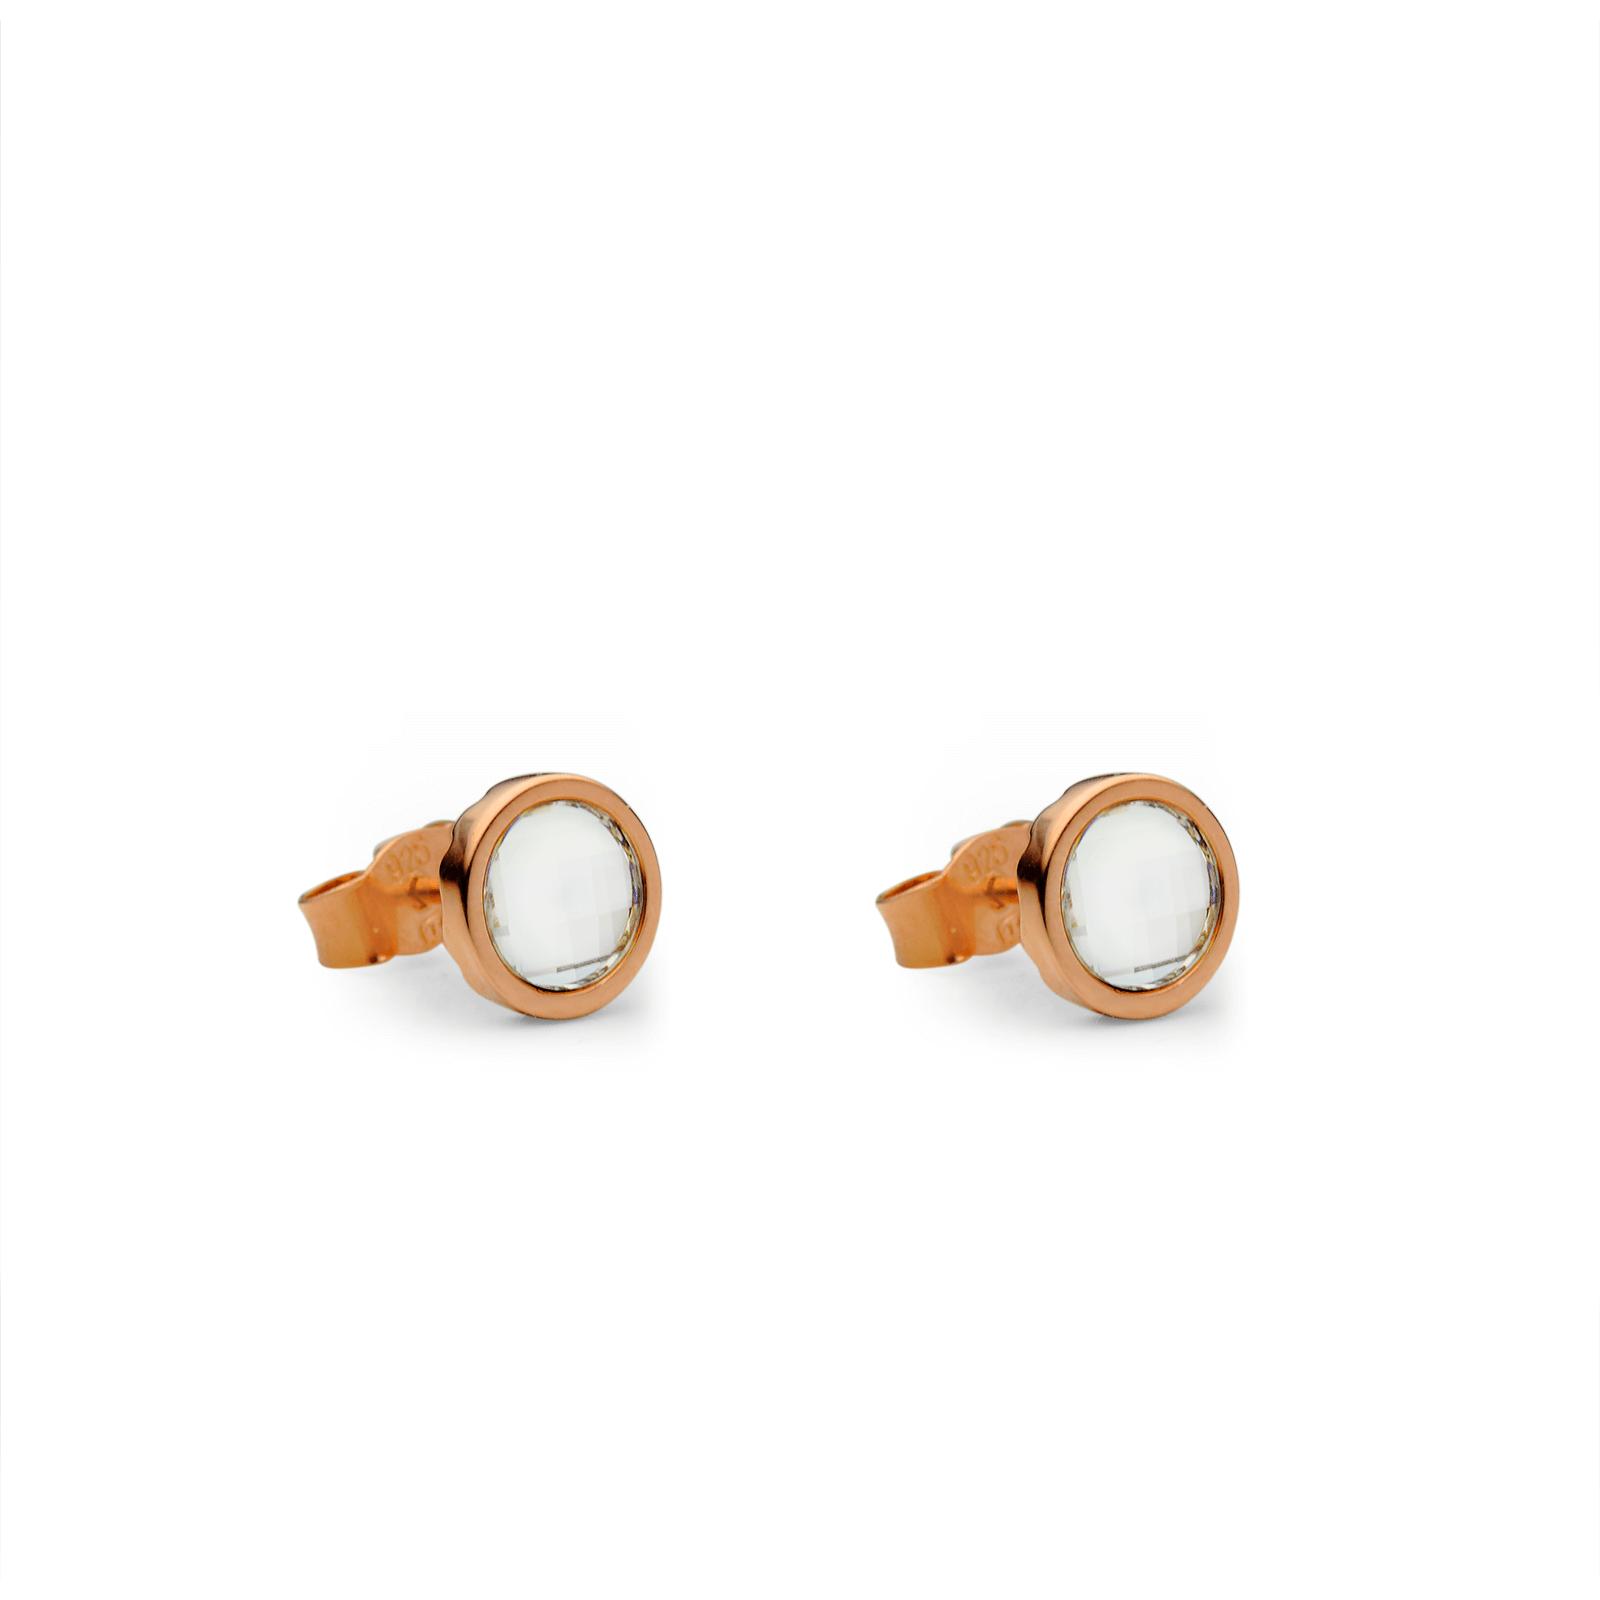 EarringsSilver 925/000Rhodium platedSwarovski crystal fi 6 mm - 2 x